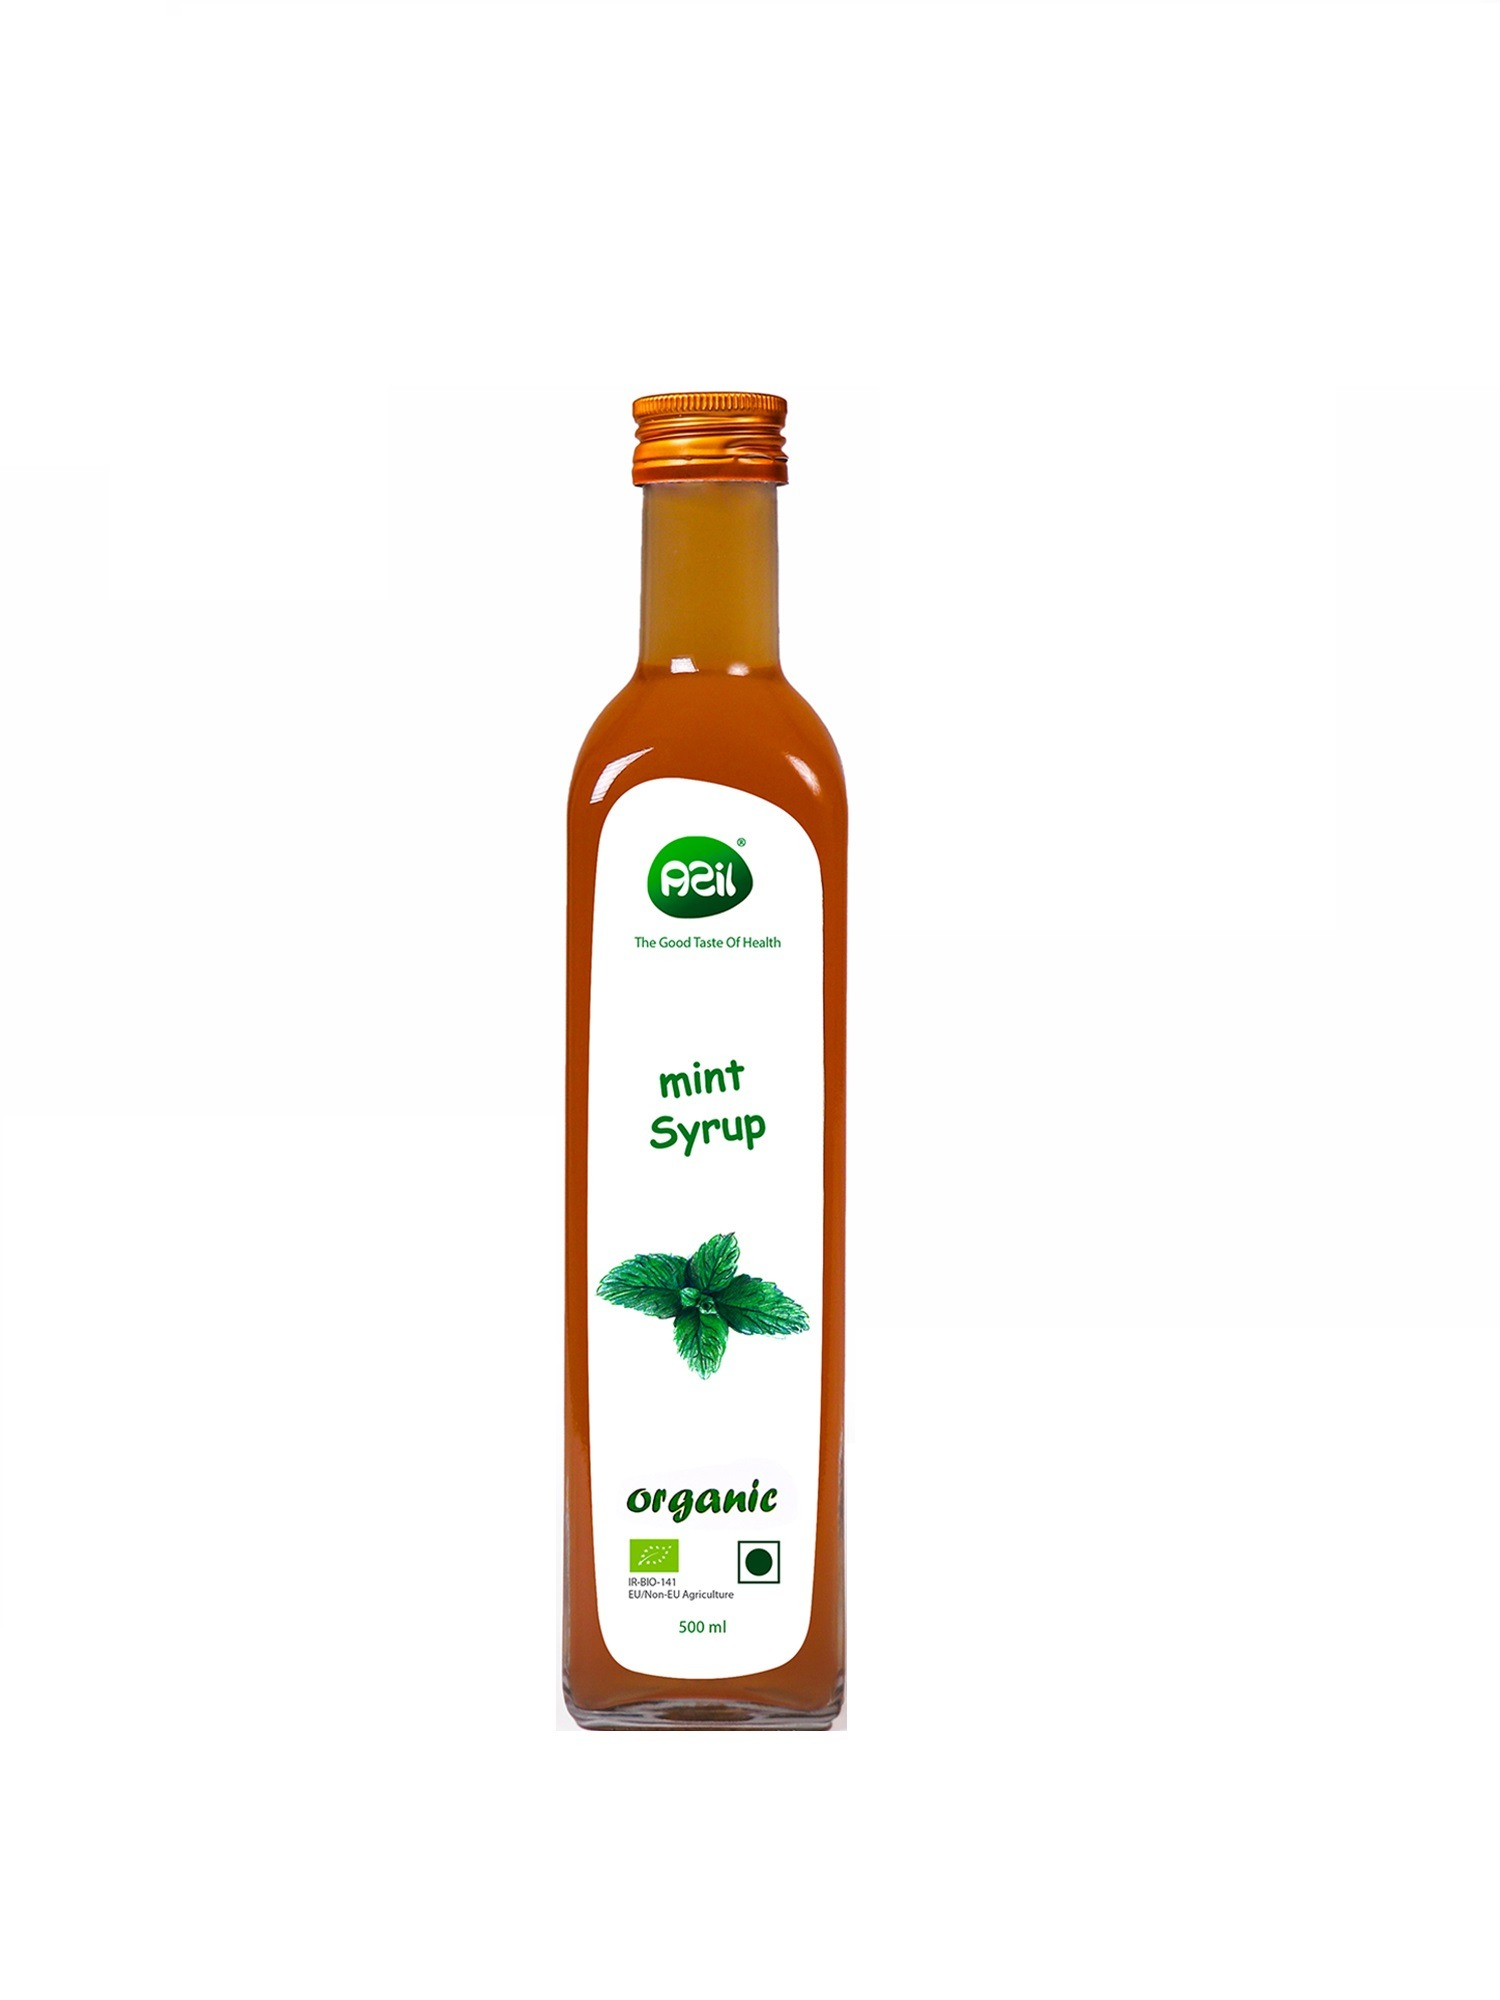 mint syrup 2 - Azil Organic Mint Syrup (Mentha spicata L.)